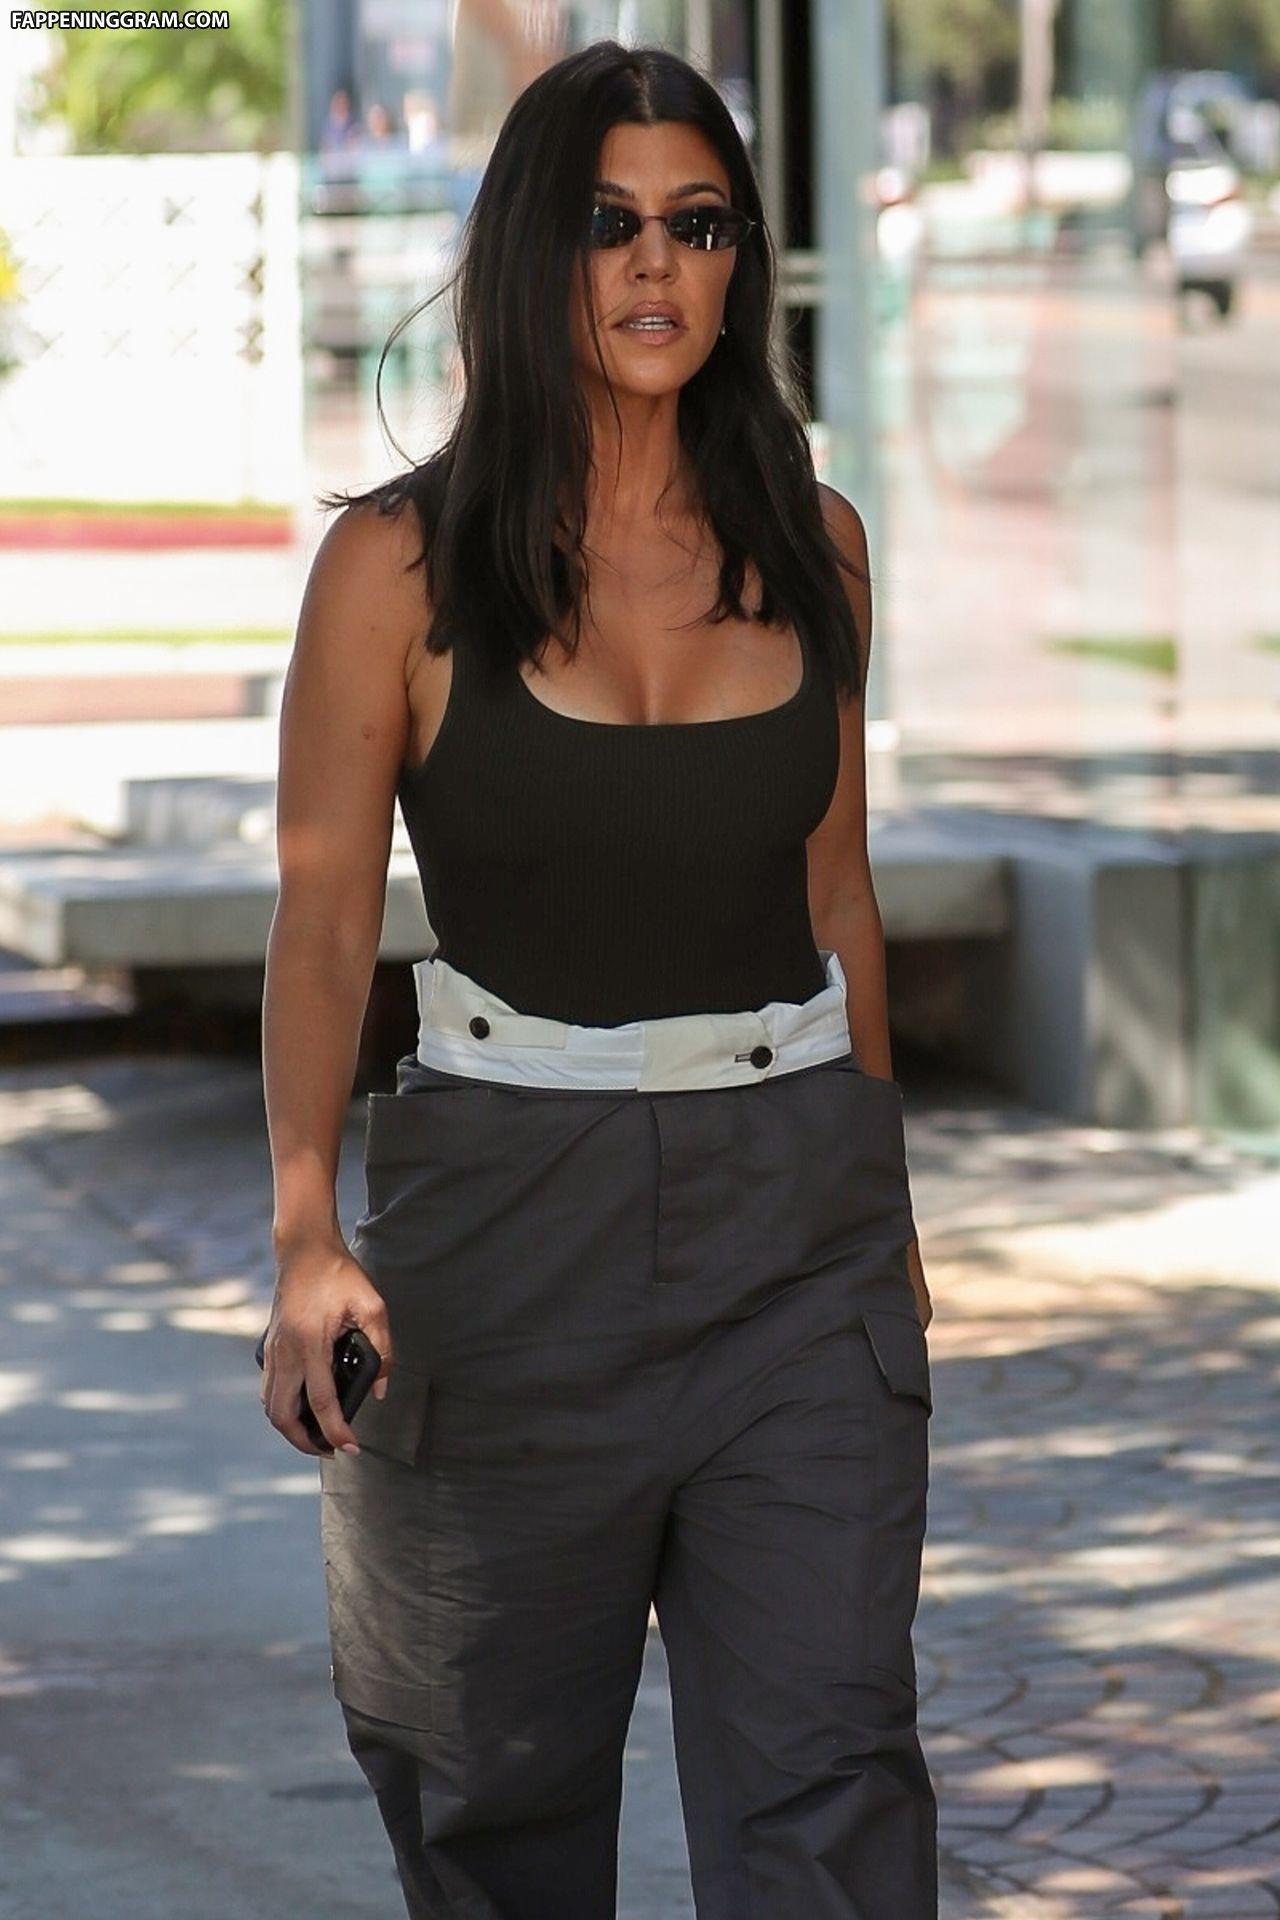 Kourtney Kardashian Nude The Fappening - Page 10